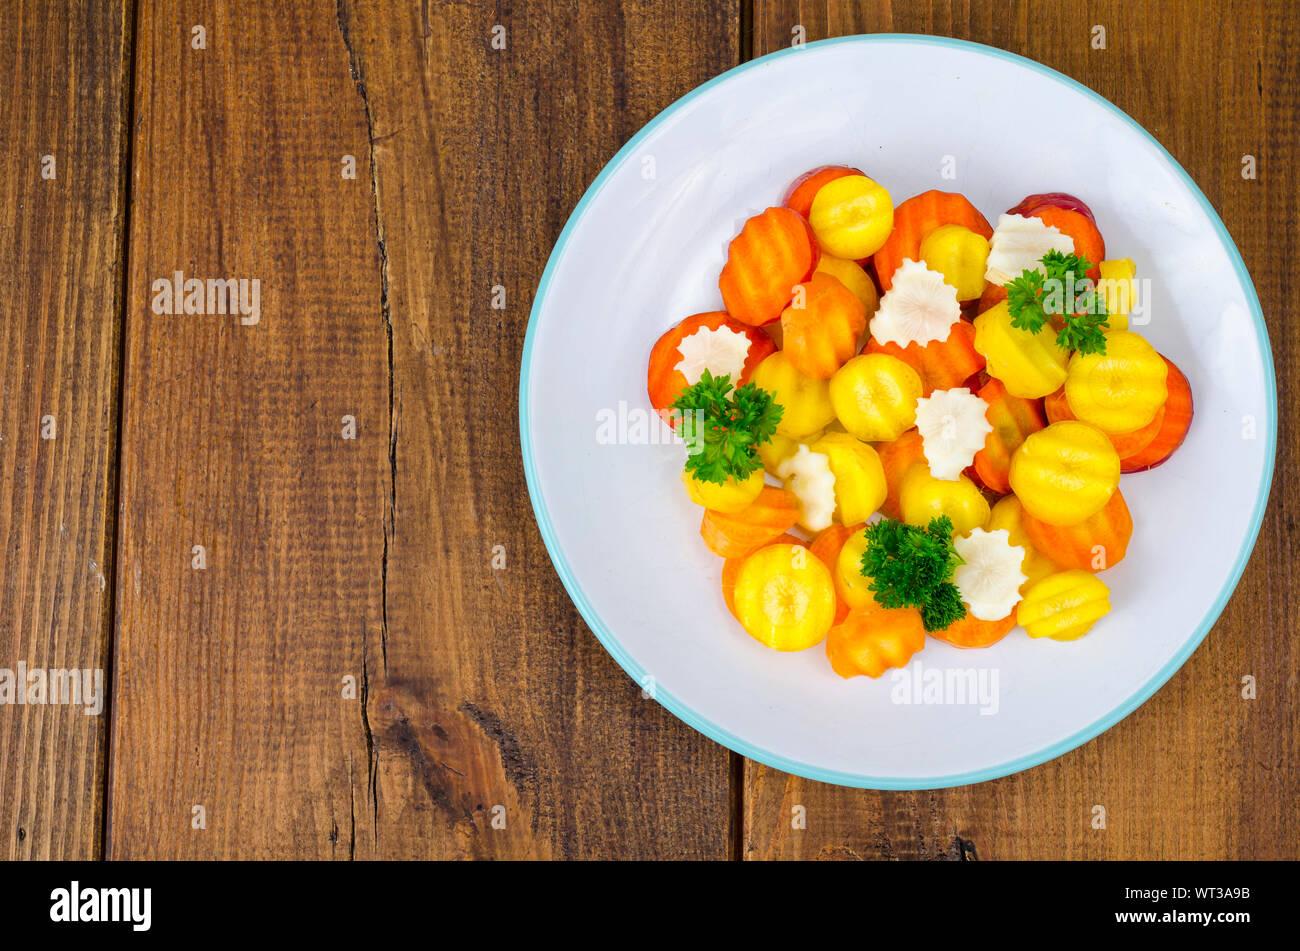 Dietary vegetable carrot salad on wooden background. Studio Photo Stock Photo